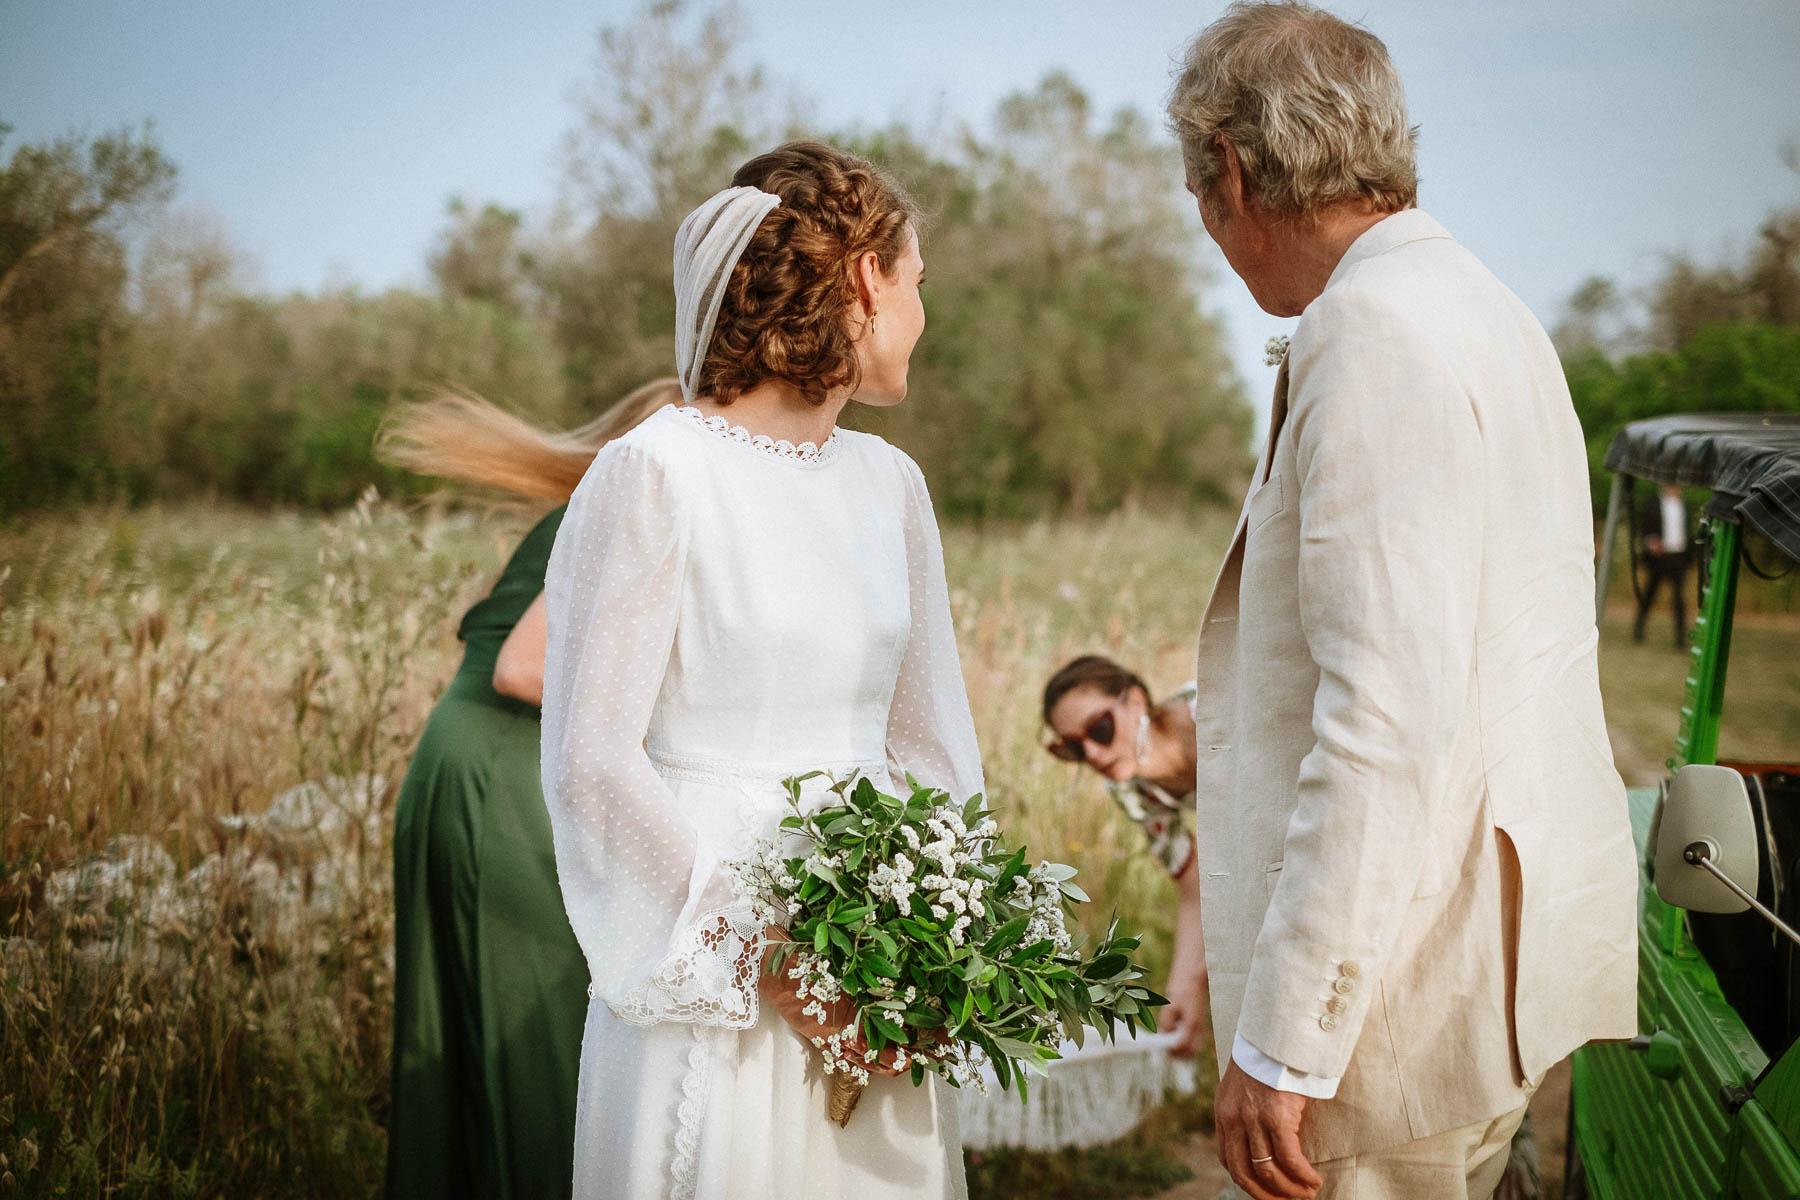 private venue wedding sanarica 07.jpg